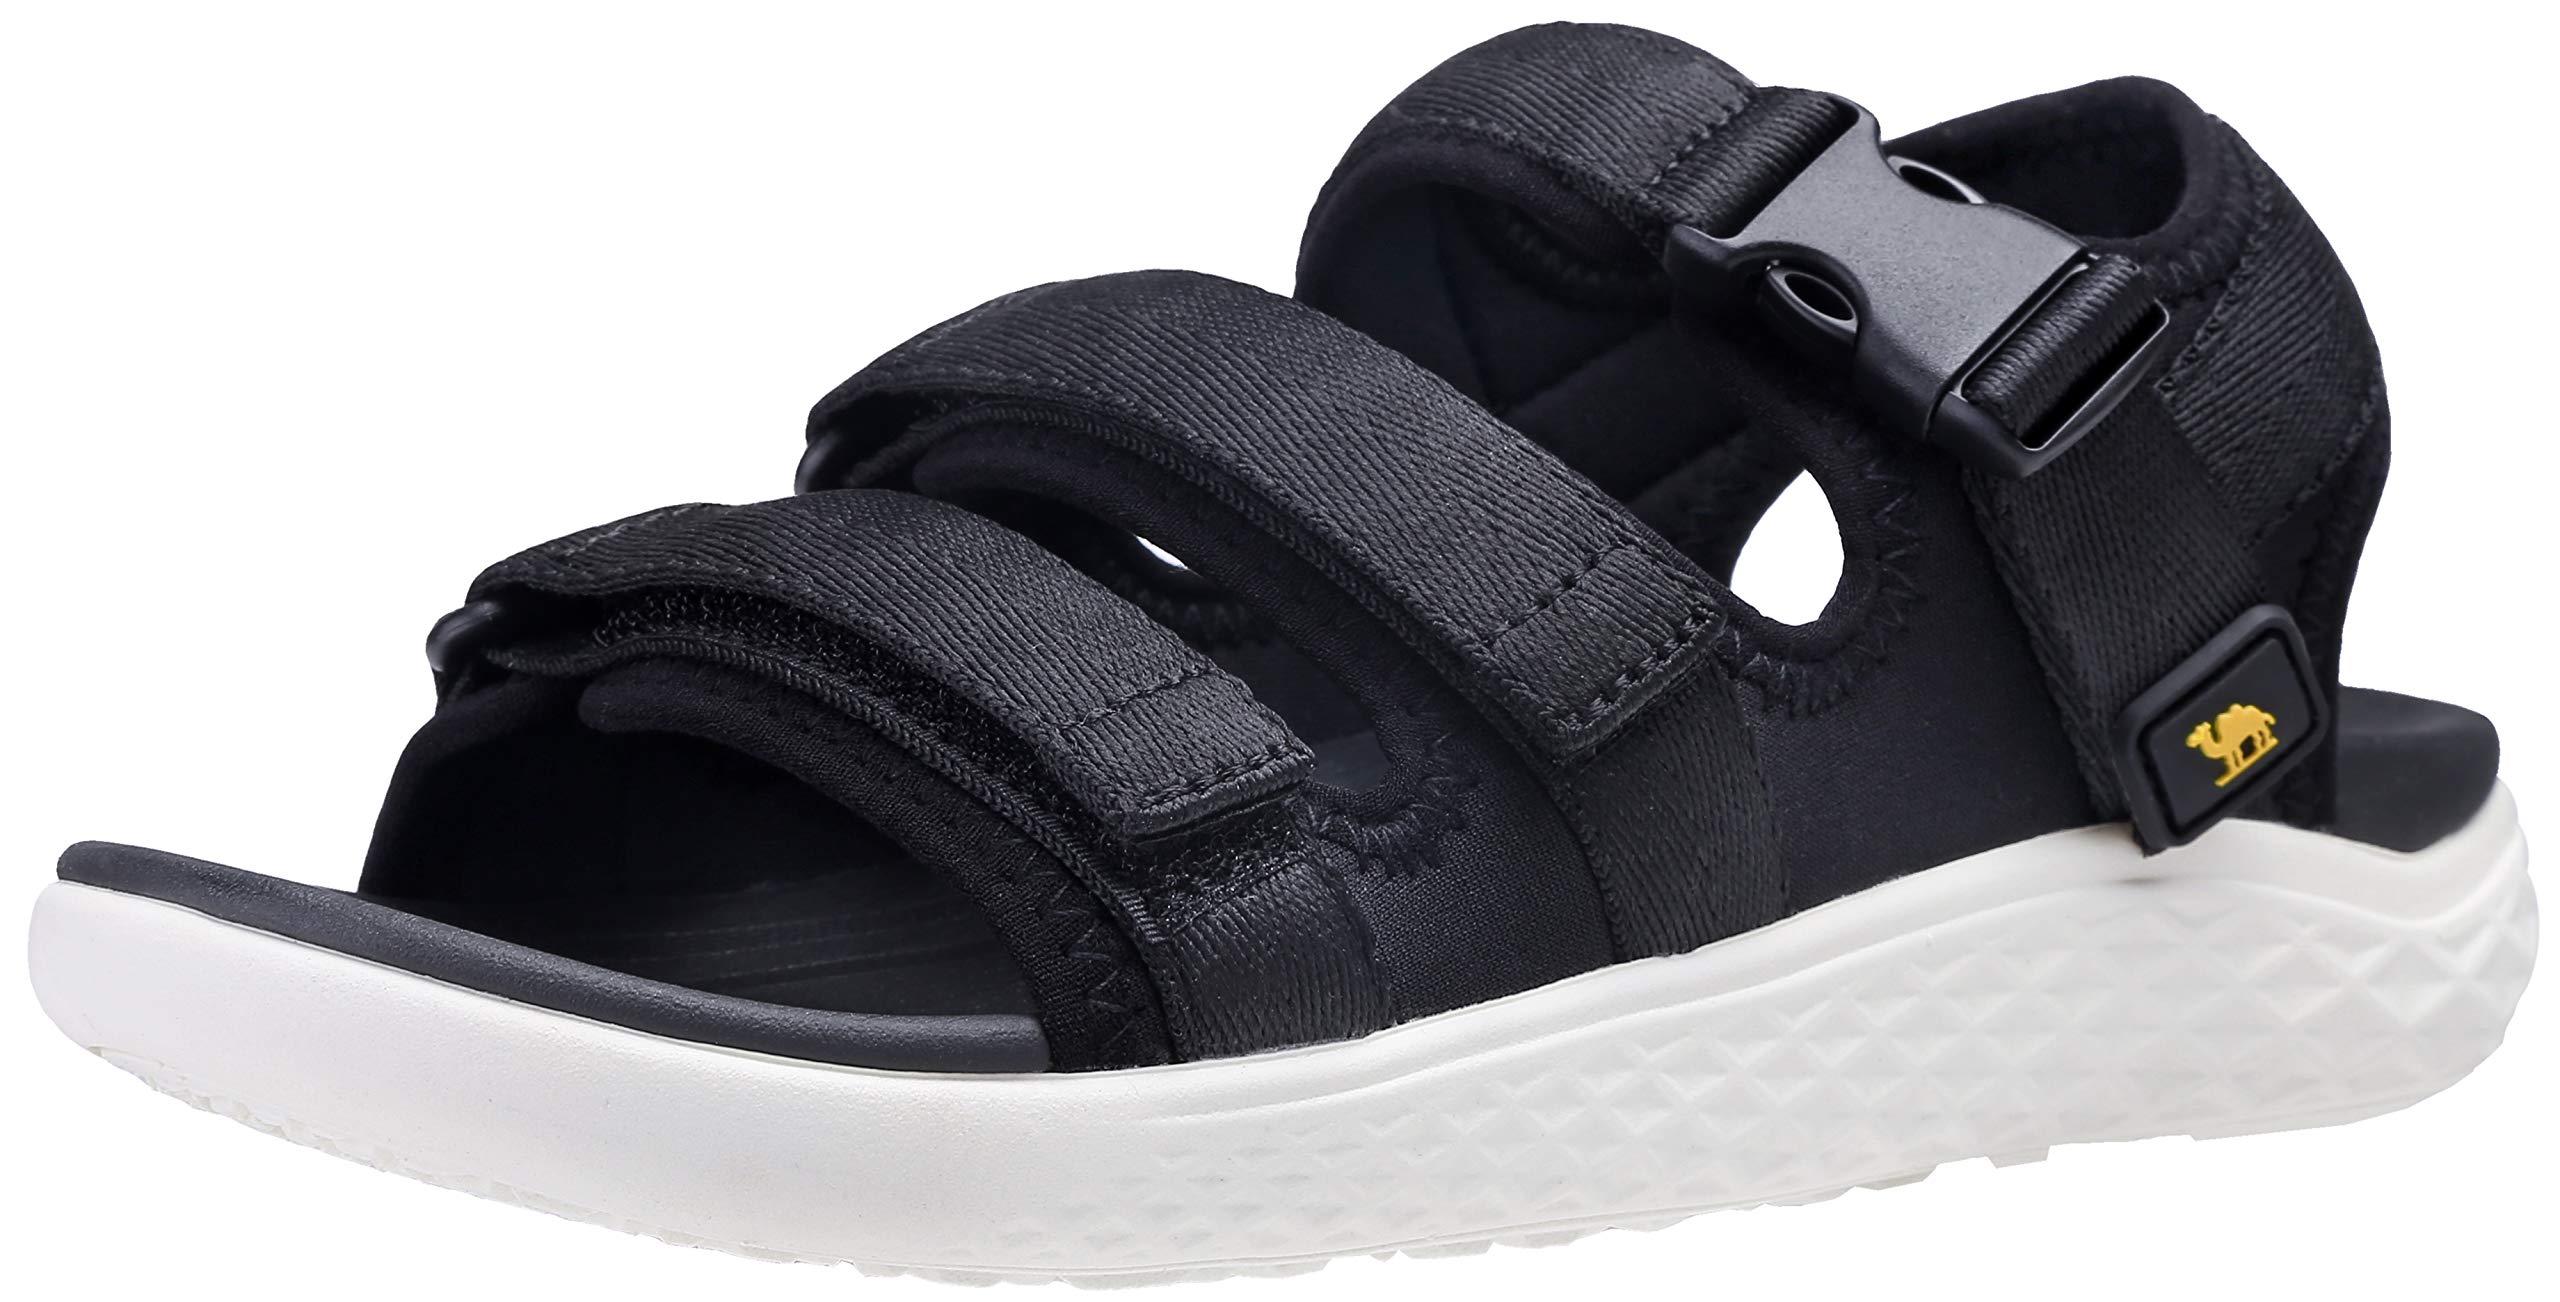 CAMEL CROWN Women Walking Sandals Sport Waterproof Water Shoes Comfortable 3 Strap Hiking Athletic Outdoor Beach